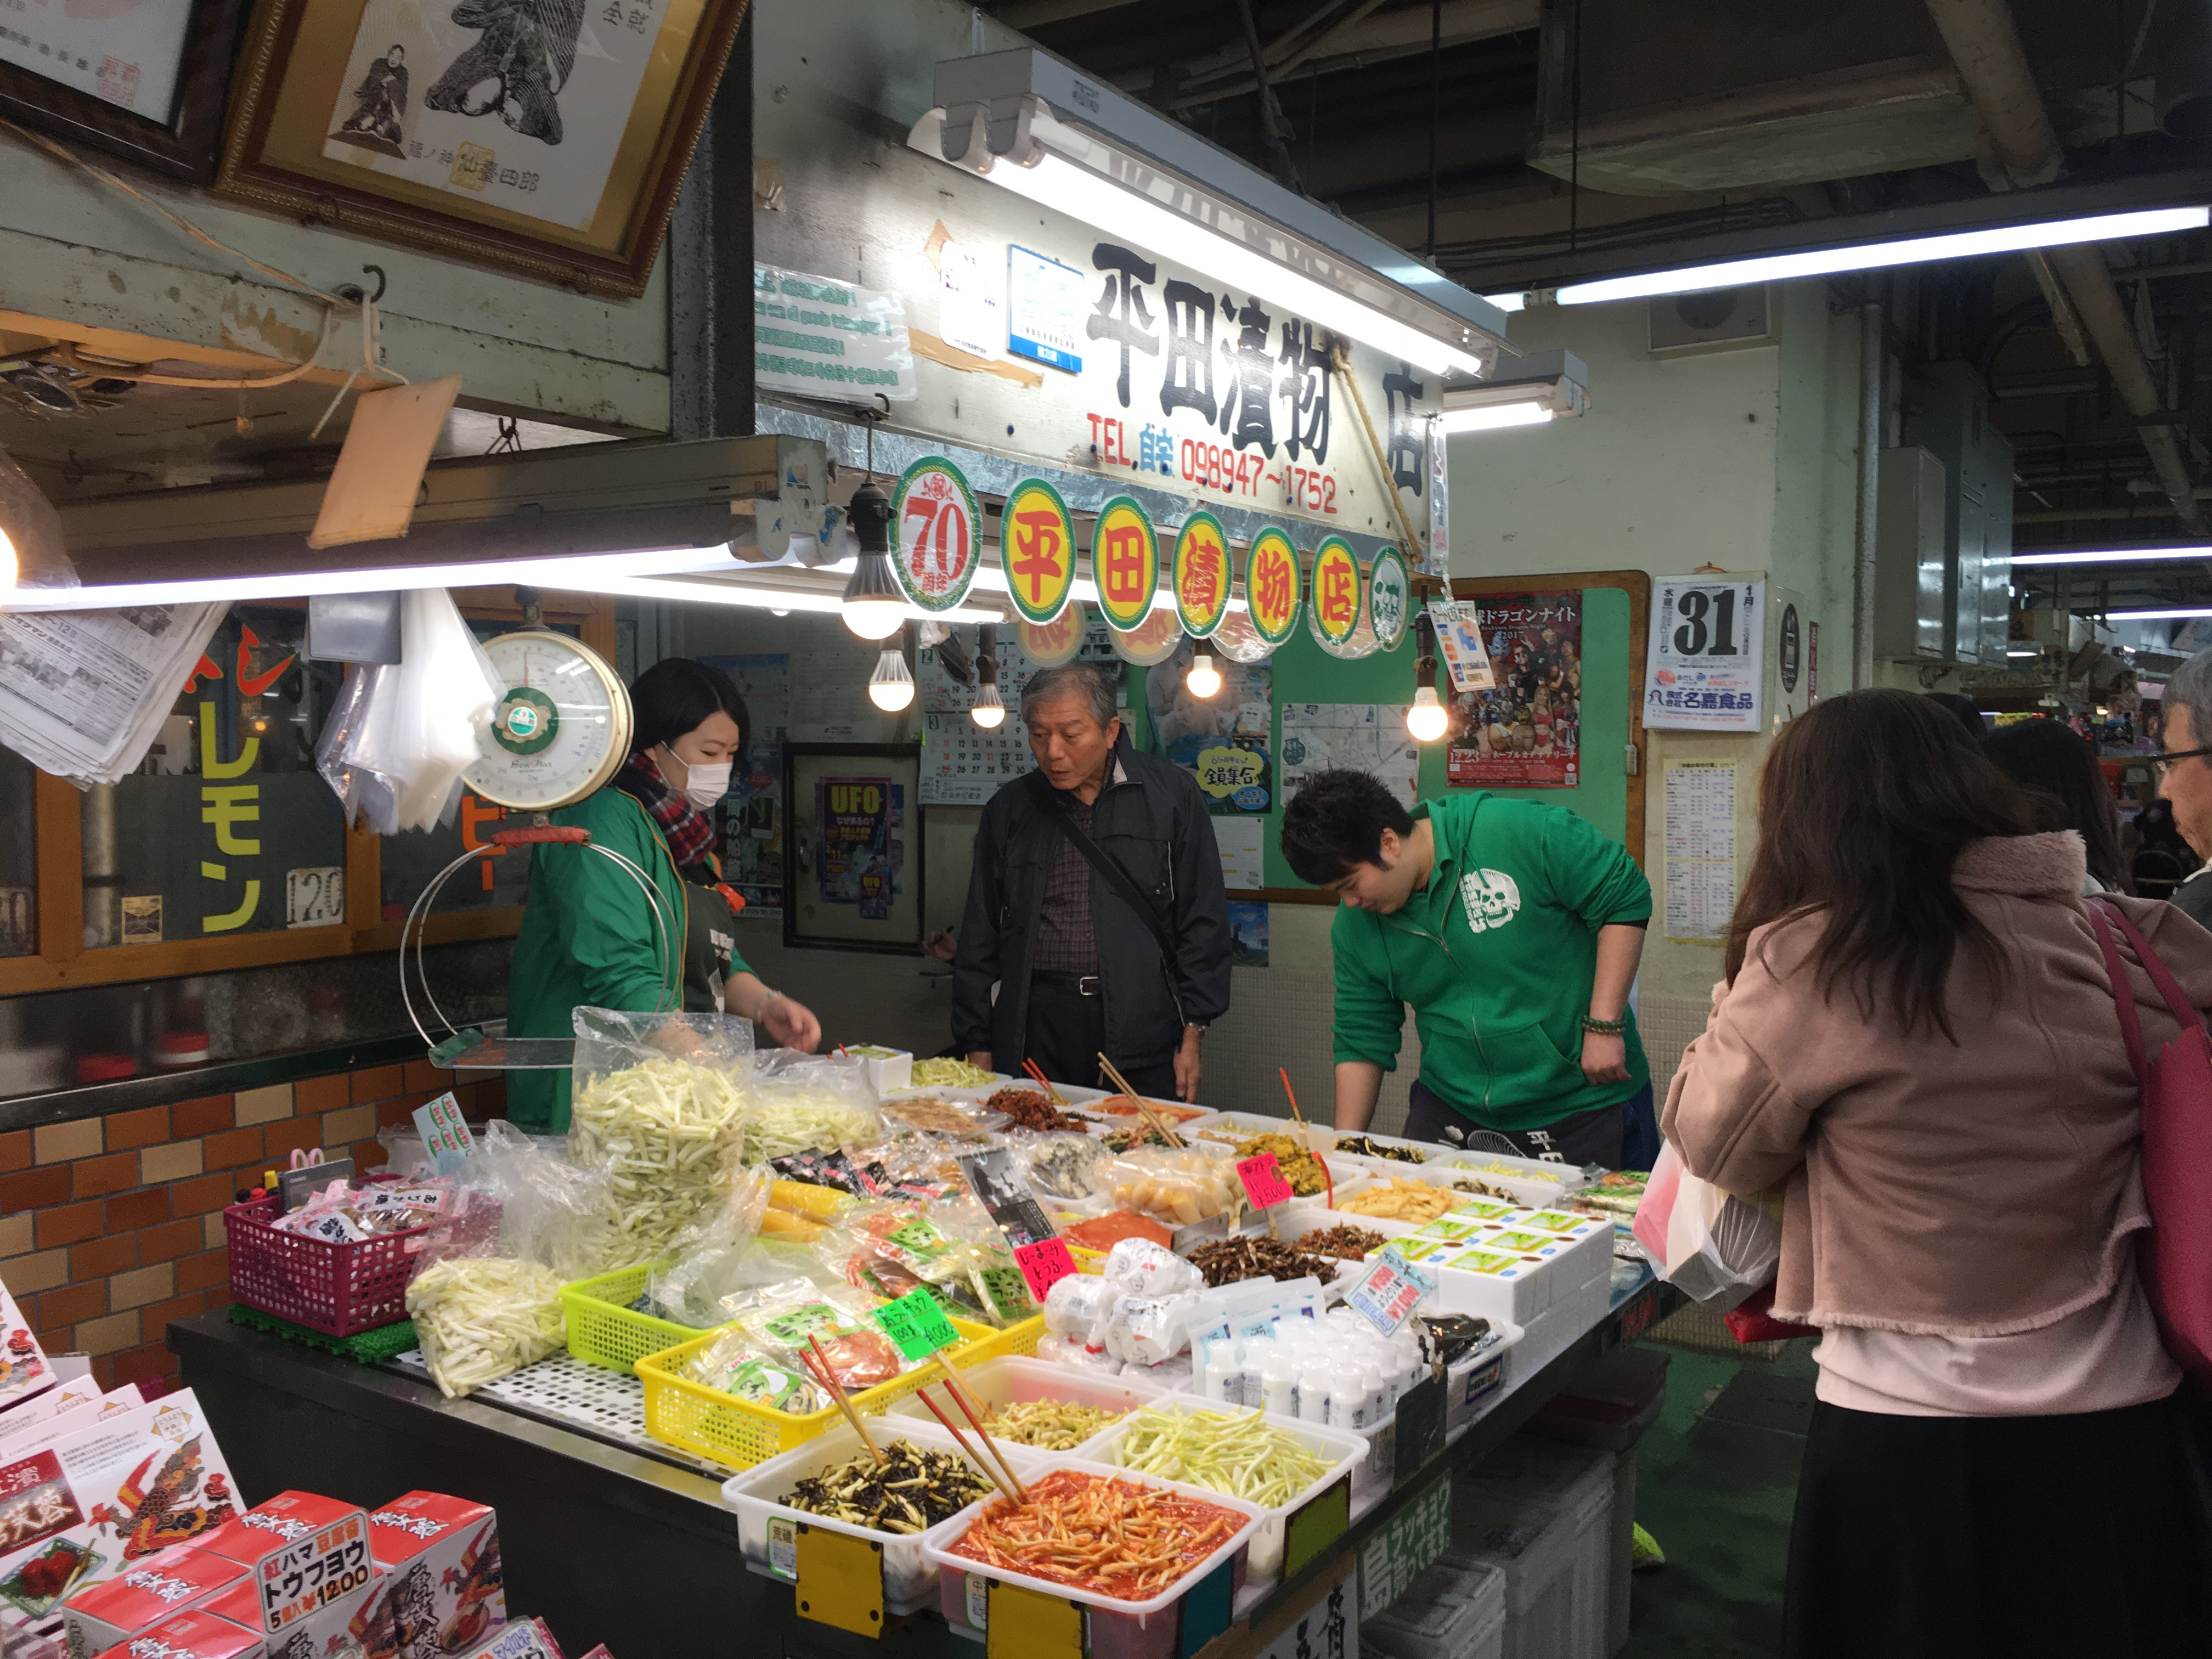 「平田漬物店 フリー画像 沖縄」の画像検索結果